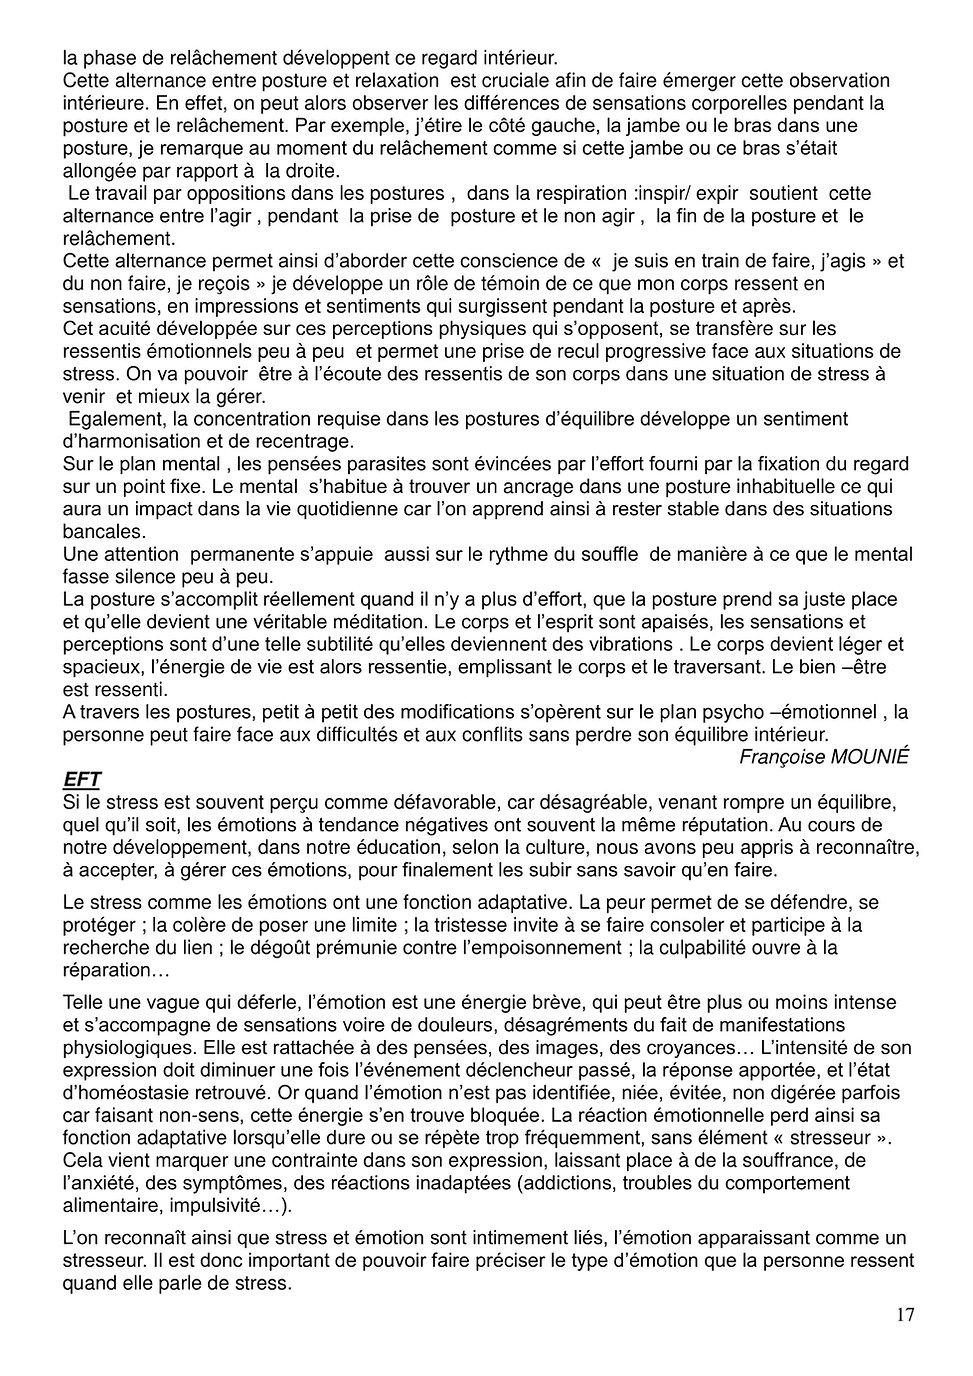 STRESS_et_ÉMOTIONS-17.jpg